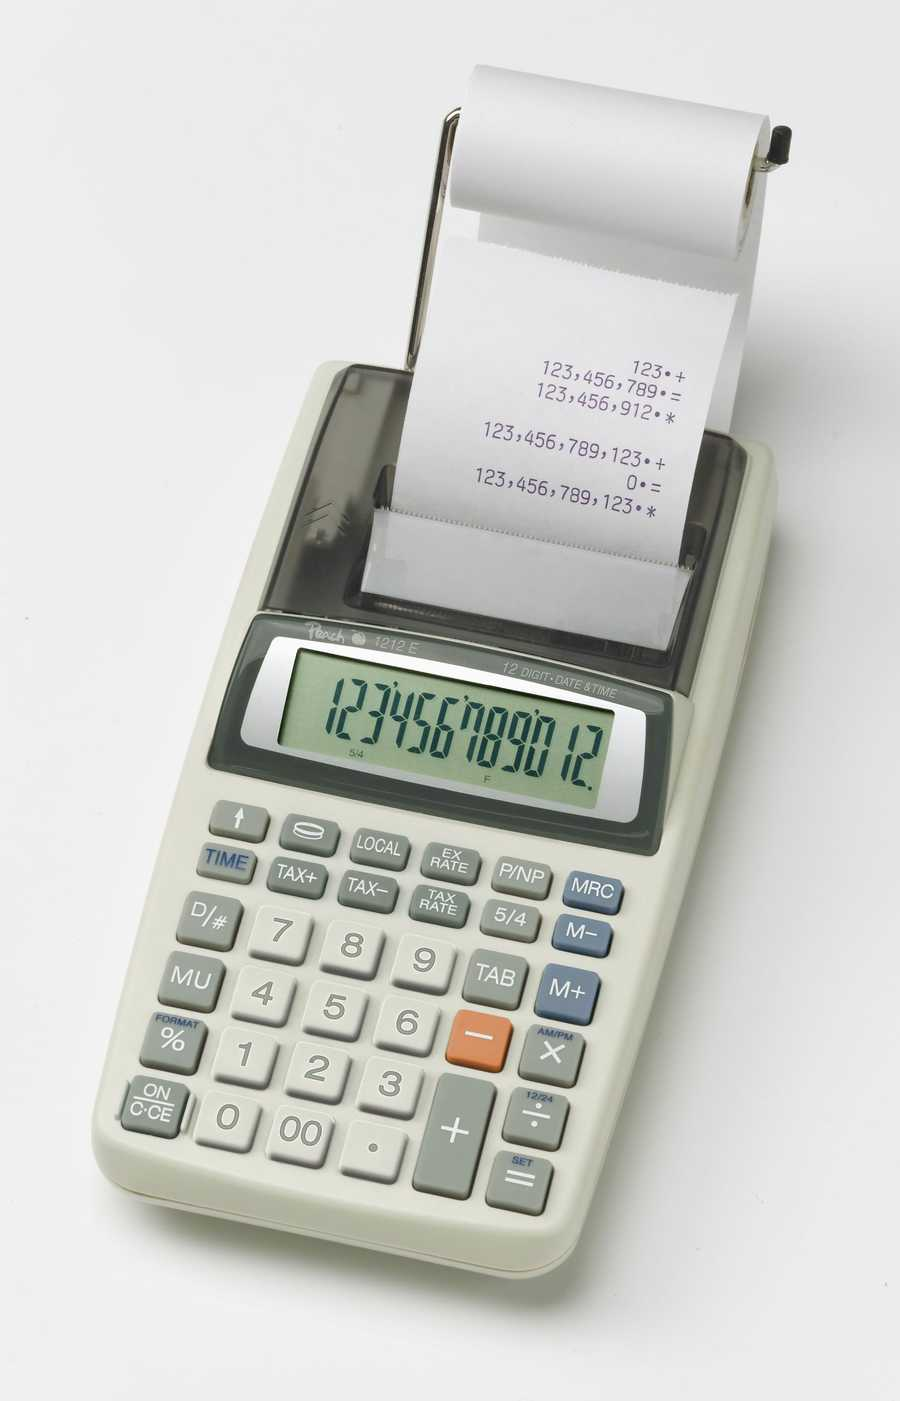 Kalkulačka Peach 12místná PR680, AC adaptér nebo baterie